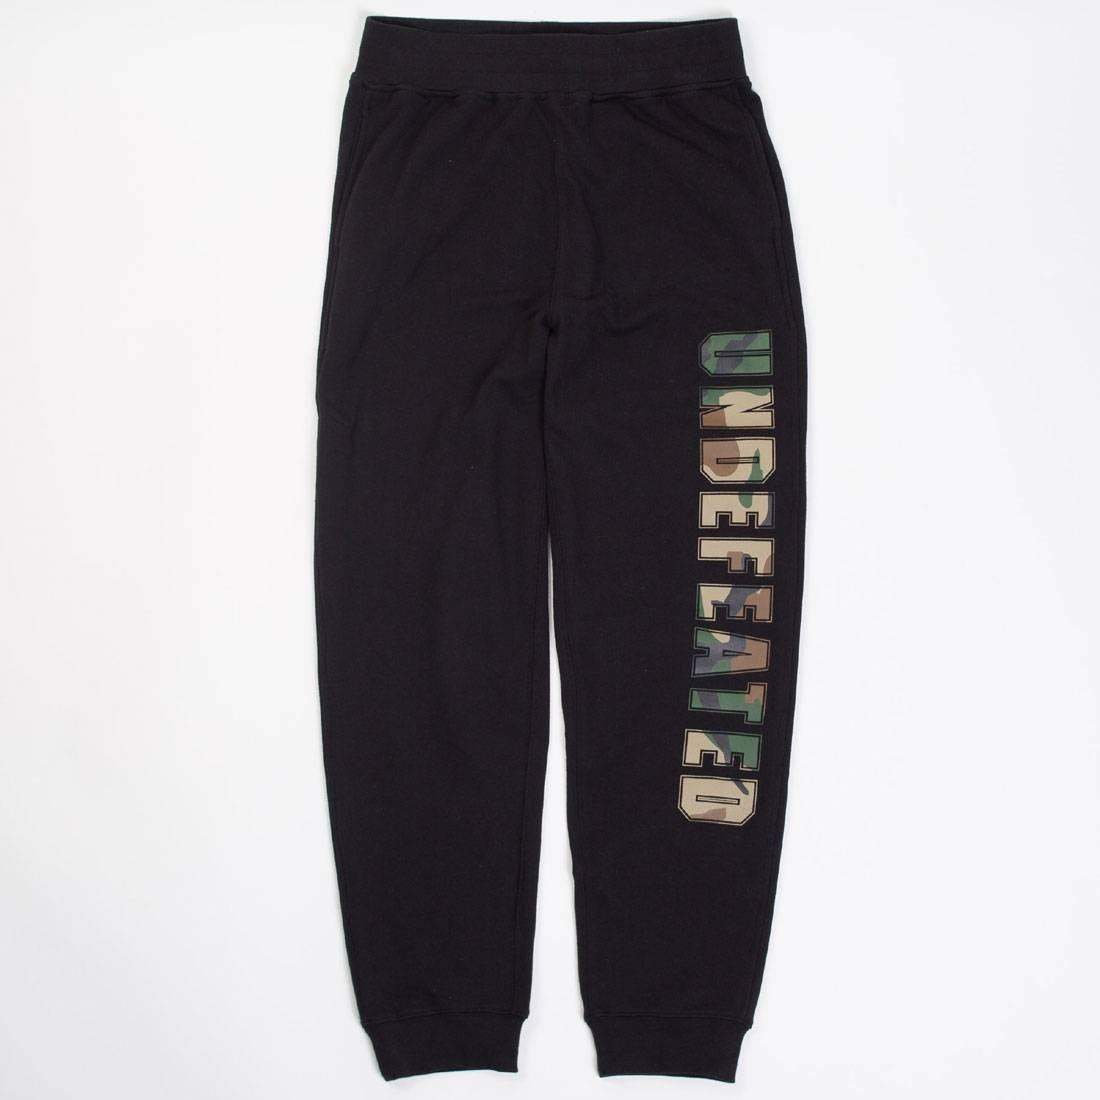 UNDEFEATED 黒 ブラック 【 BLACK UNDEFEATED MEN COMPACT SWEATPANTS 】 メンズファッション ズボン パンツ